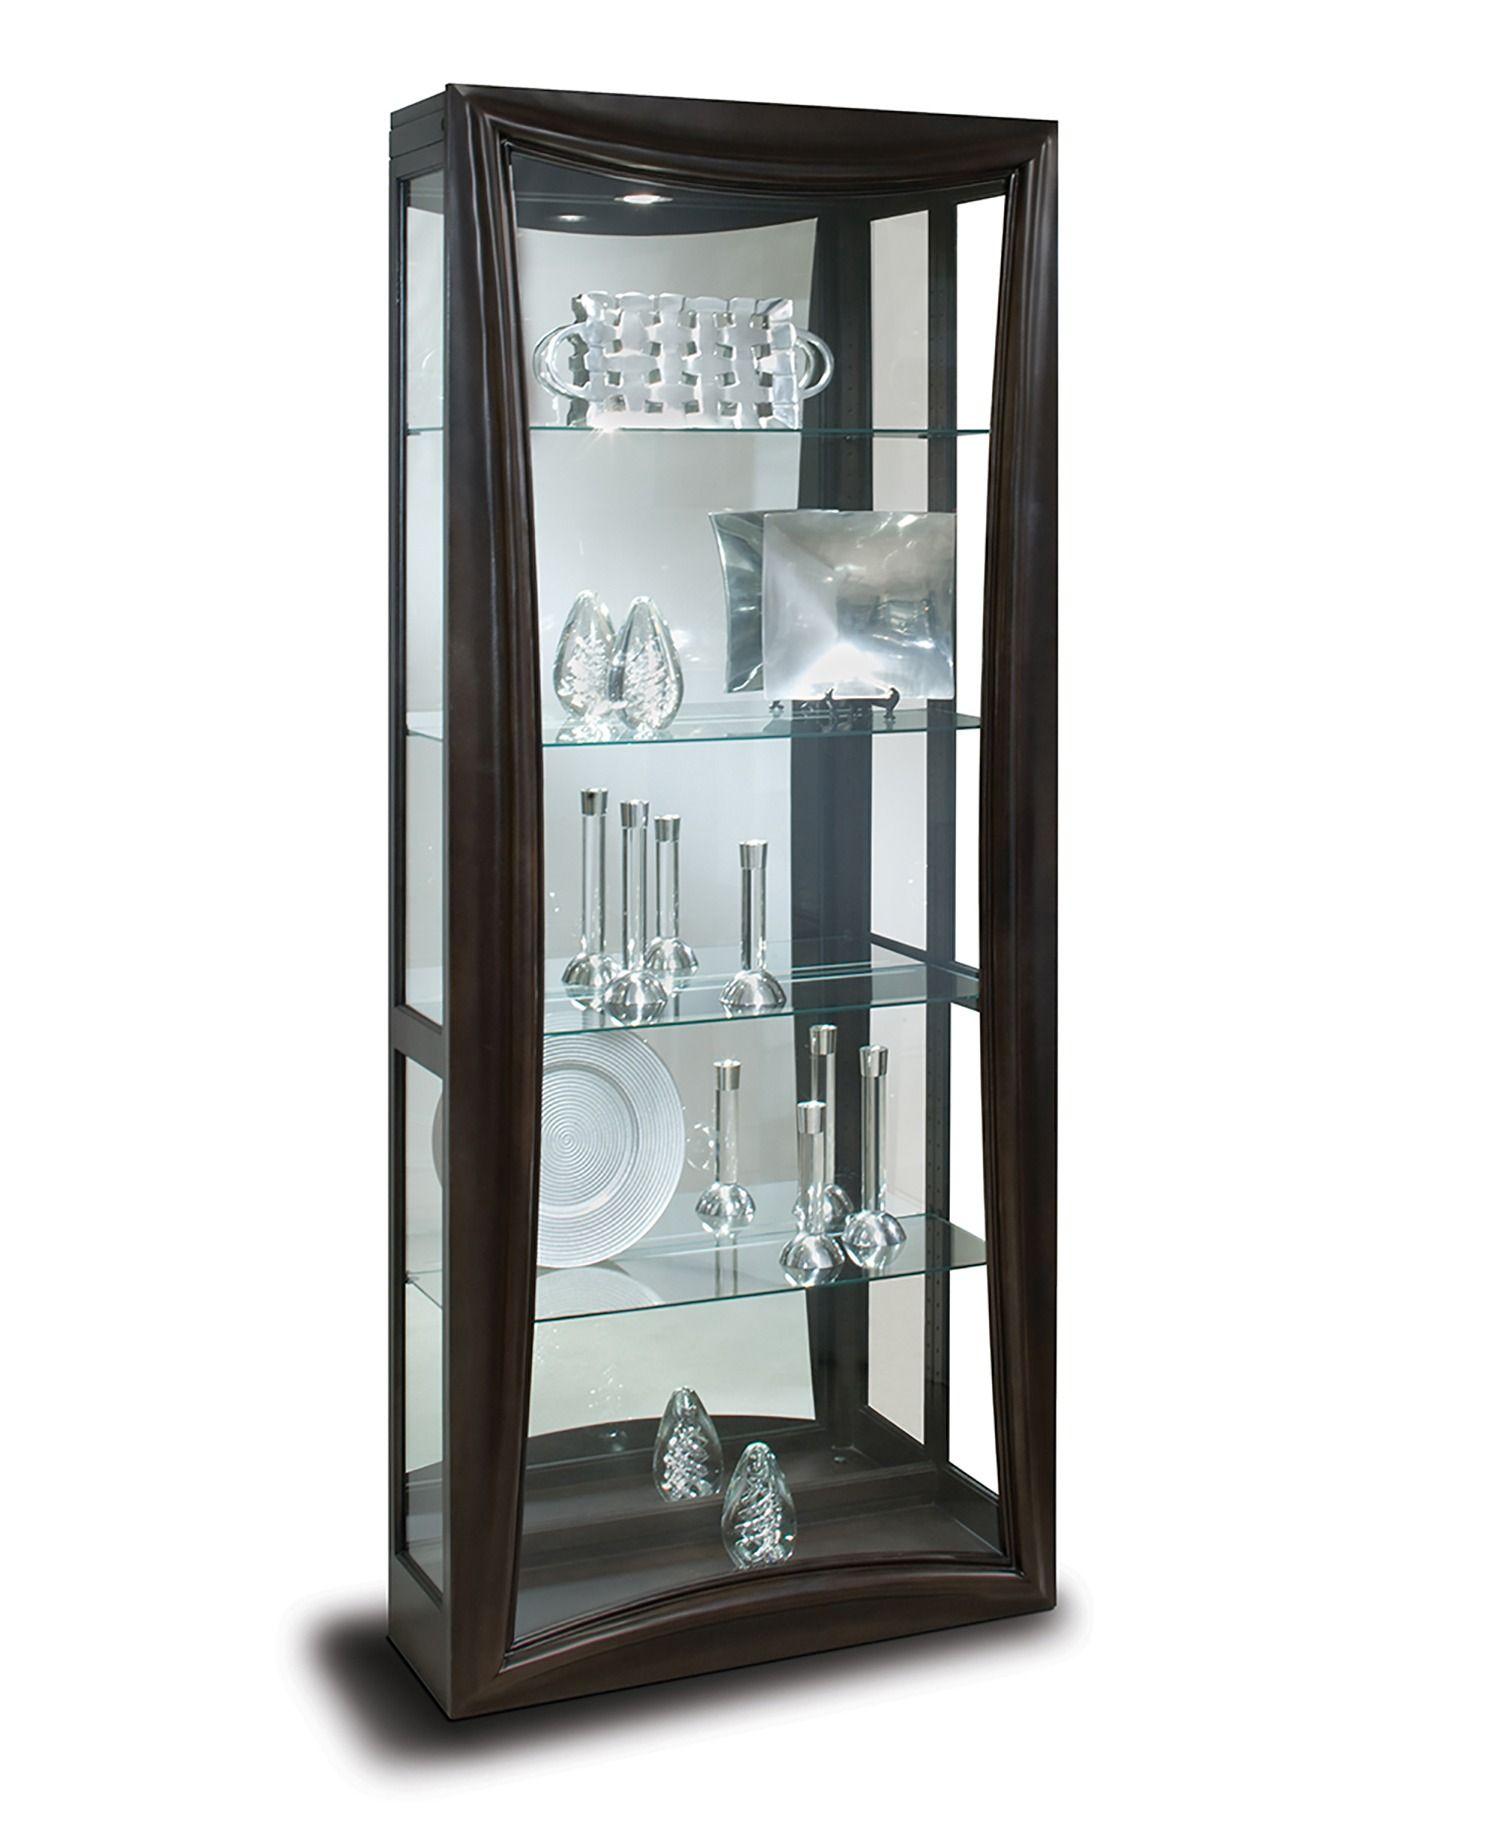 Gemini Ii 2 Way Sliding Door Curio Cabinet In Dark Espresso Philip Reinisch Furniture Home Gallery Stores Curio Cabinet Small Curio Cabinet Cabinet